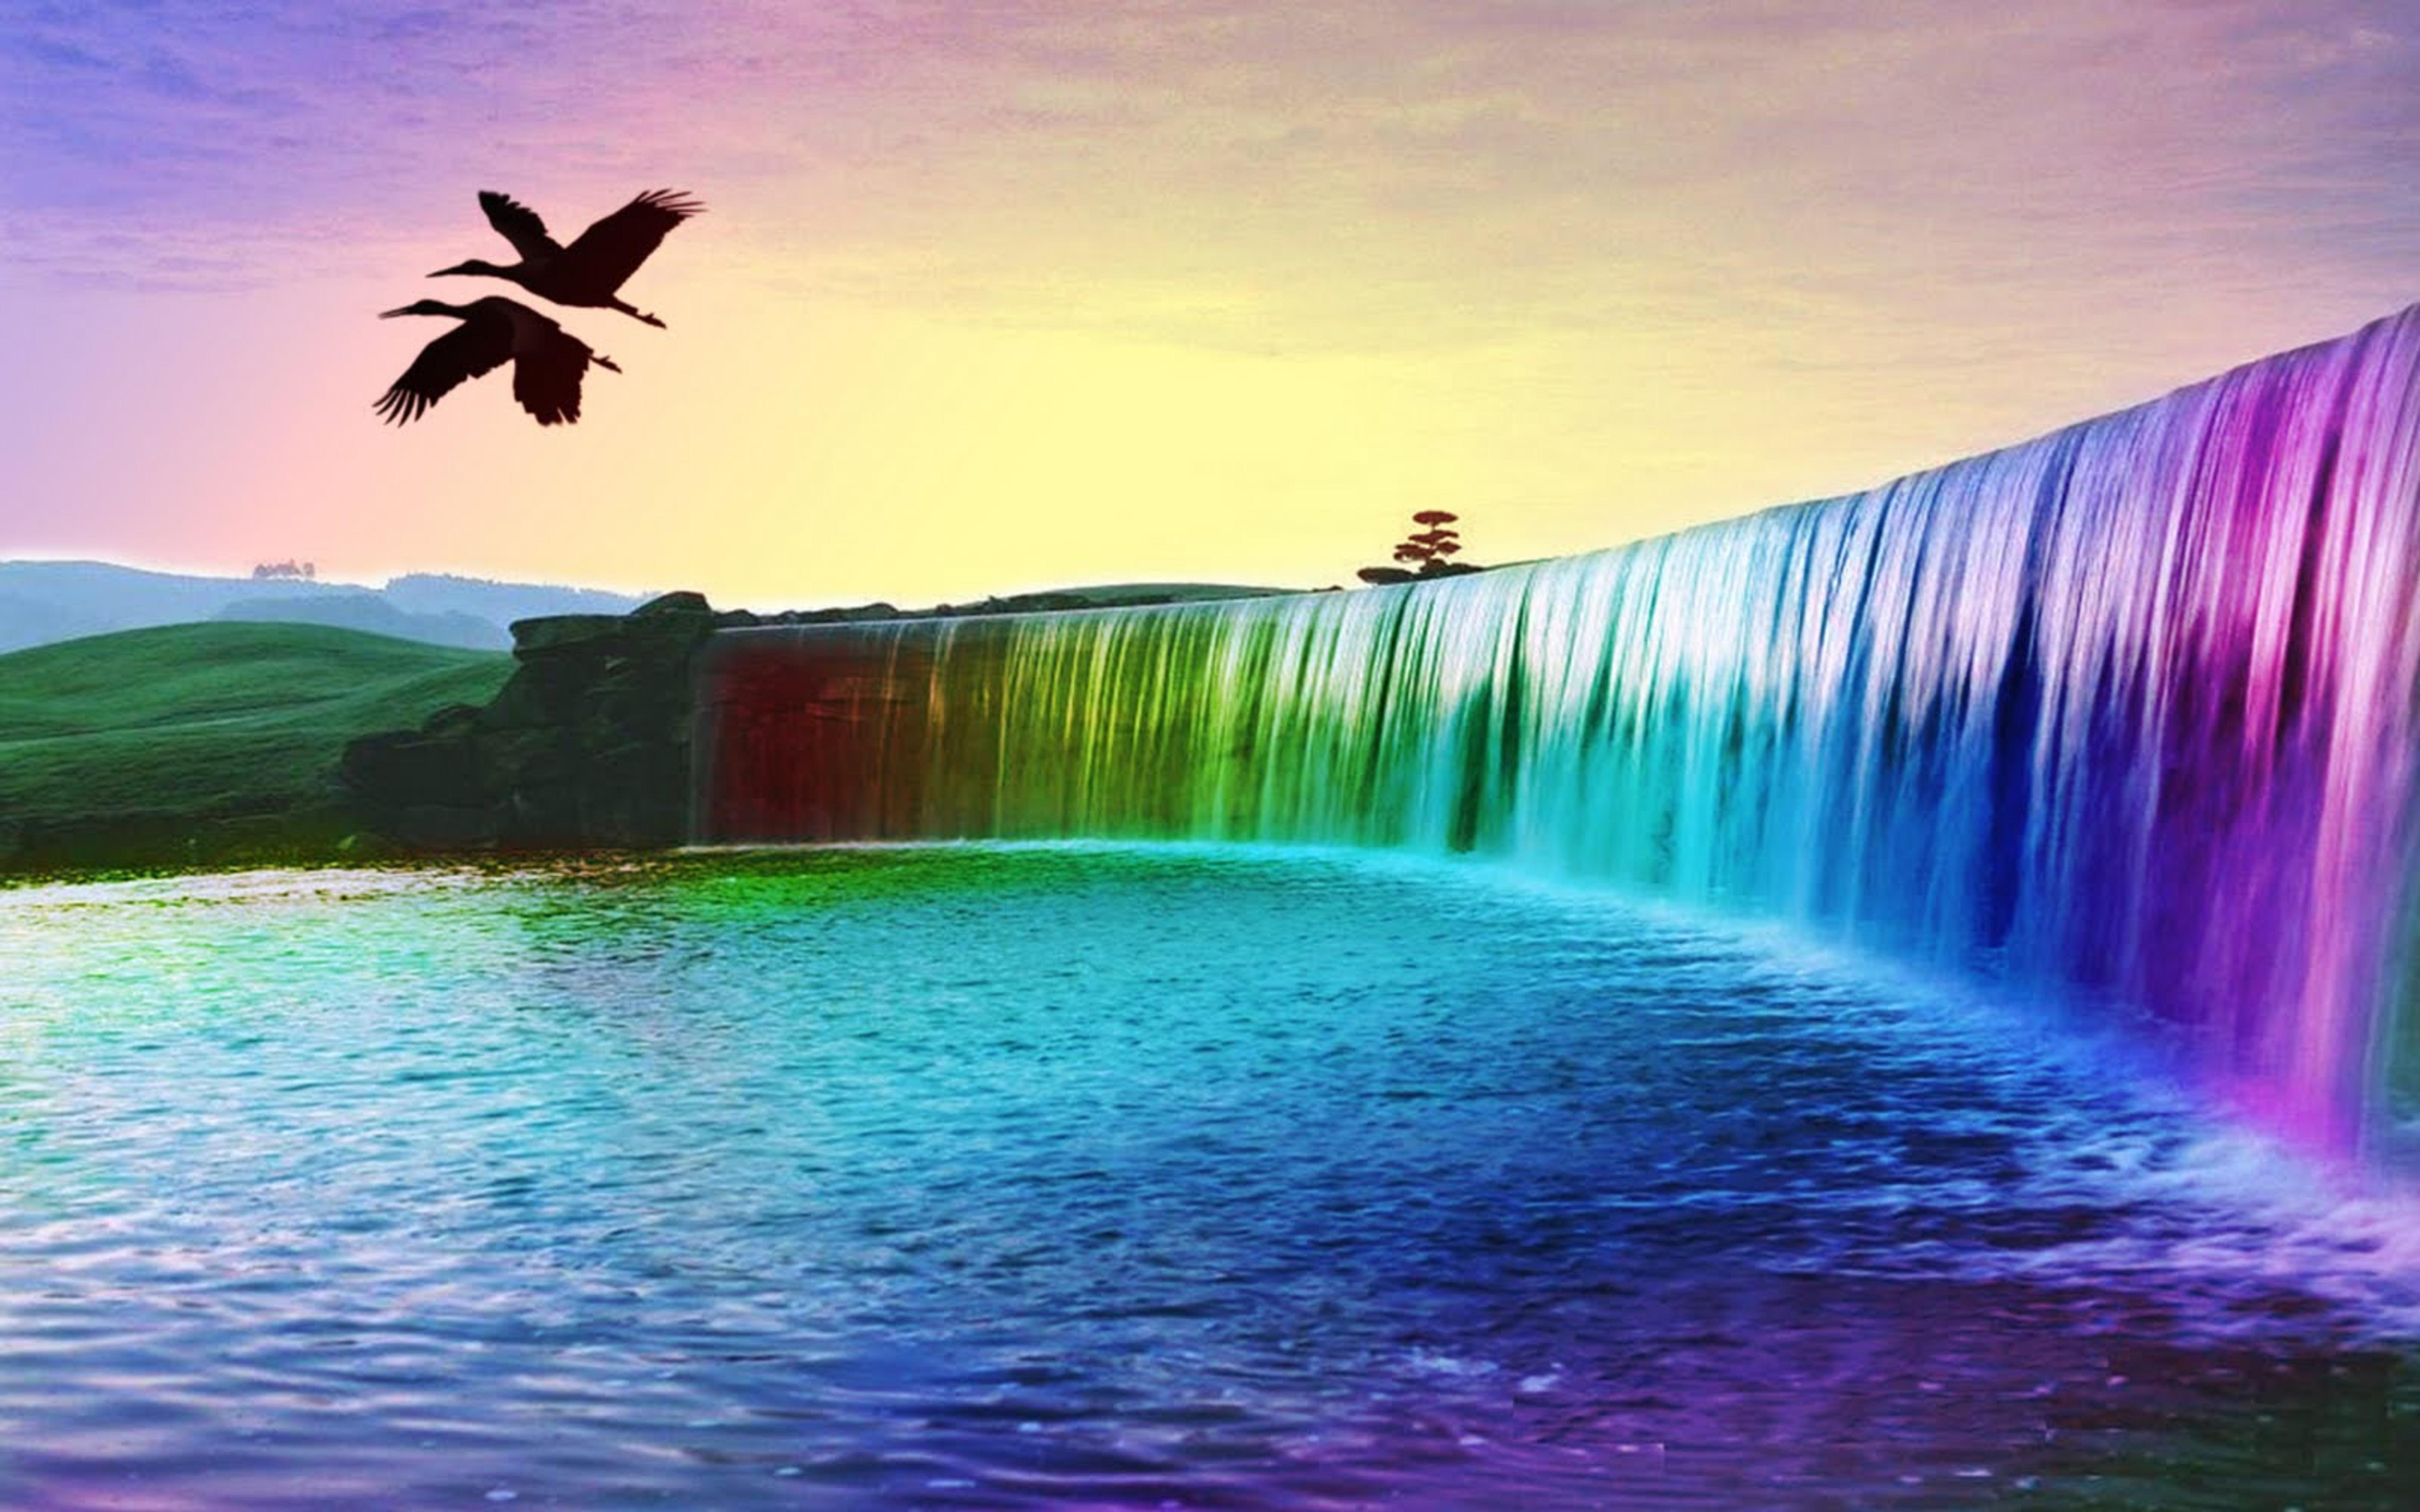 Wonderful 3d Colourful Waterfall Hd Wallpaper Wallpaper